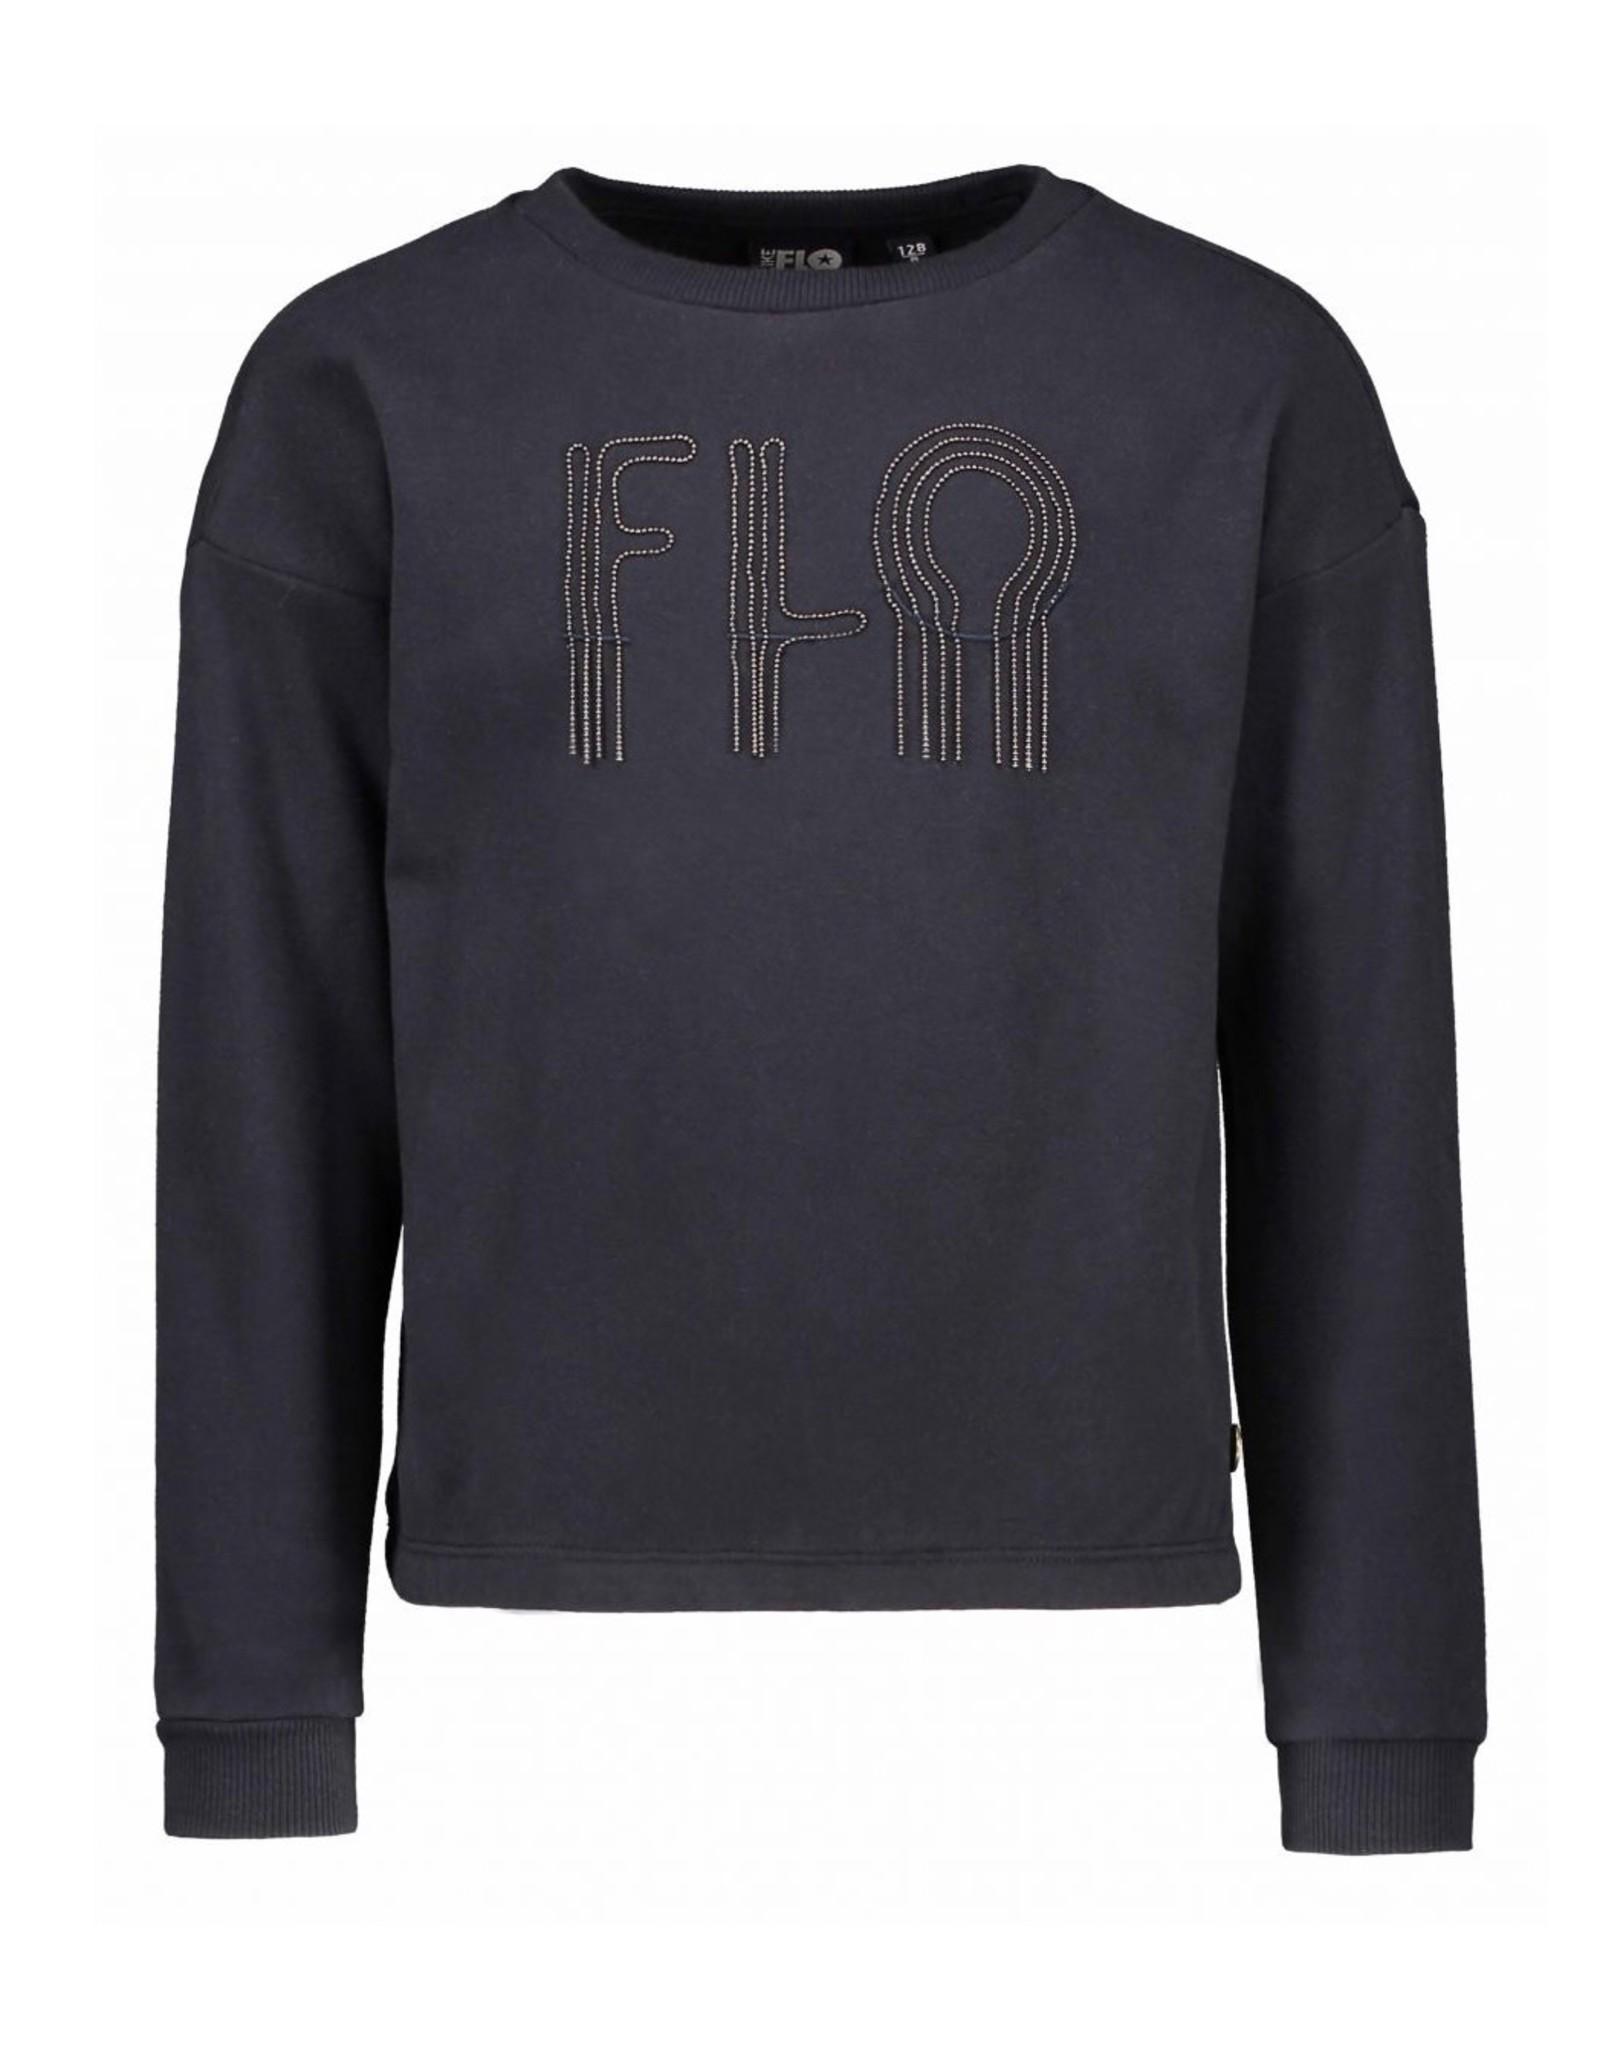 Flo F008-5301 Sweater